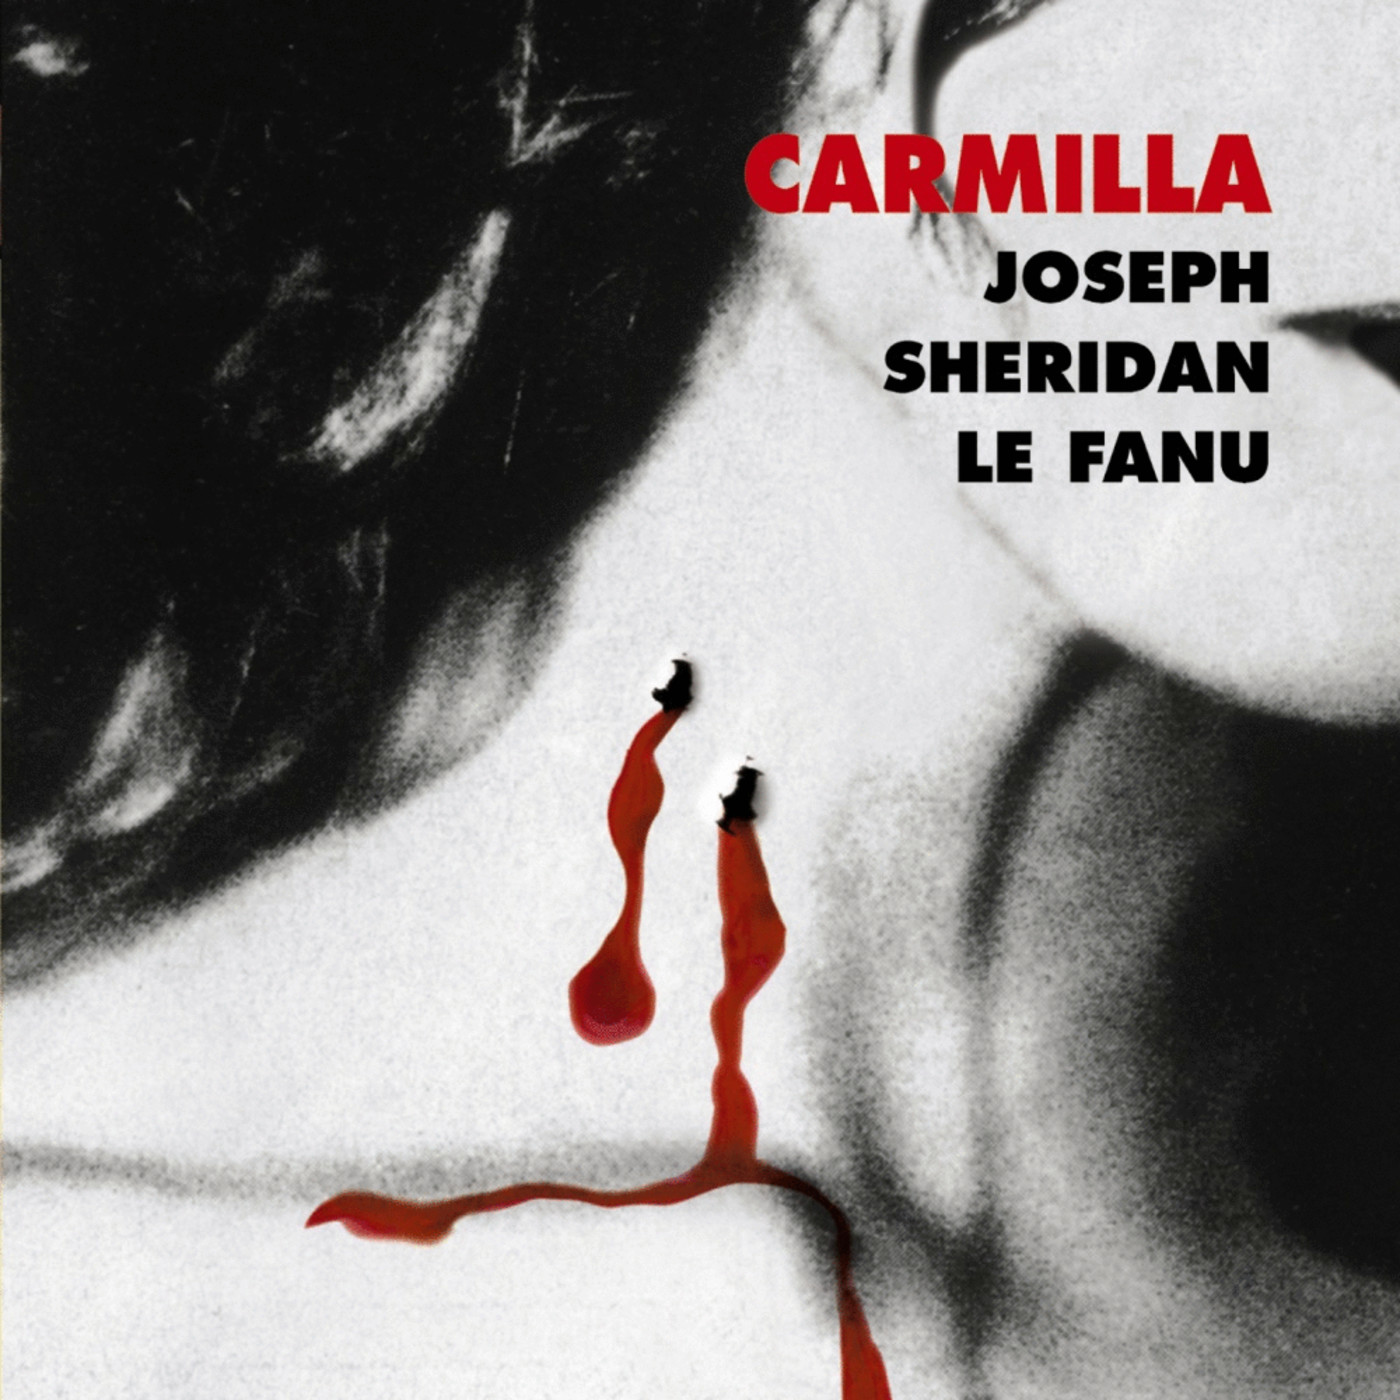 #24. AUDIOLIBRO Carmilla by Joseph Sheridan Le Fanu